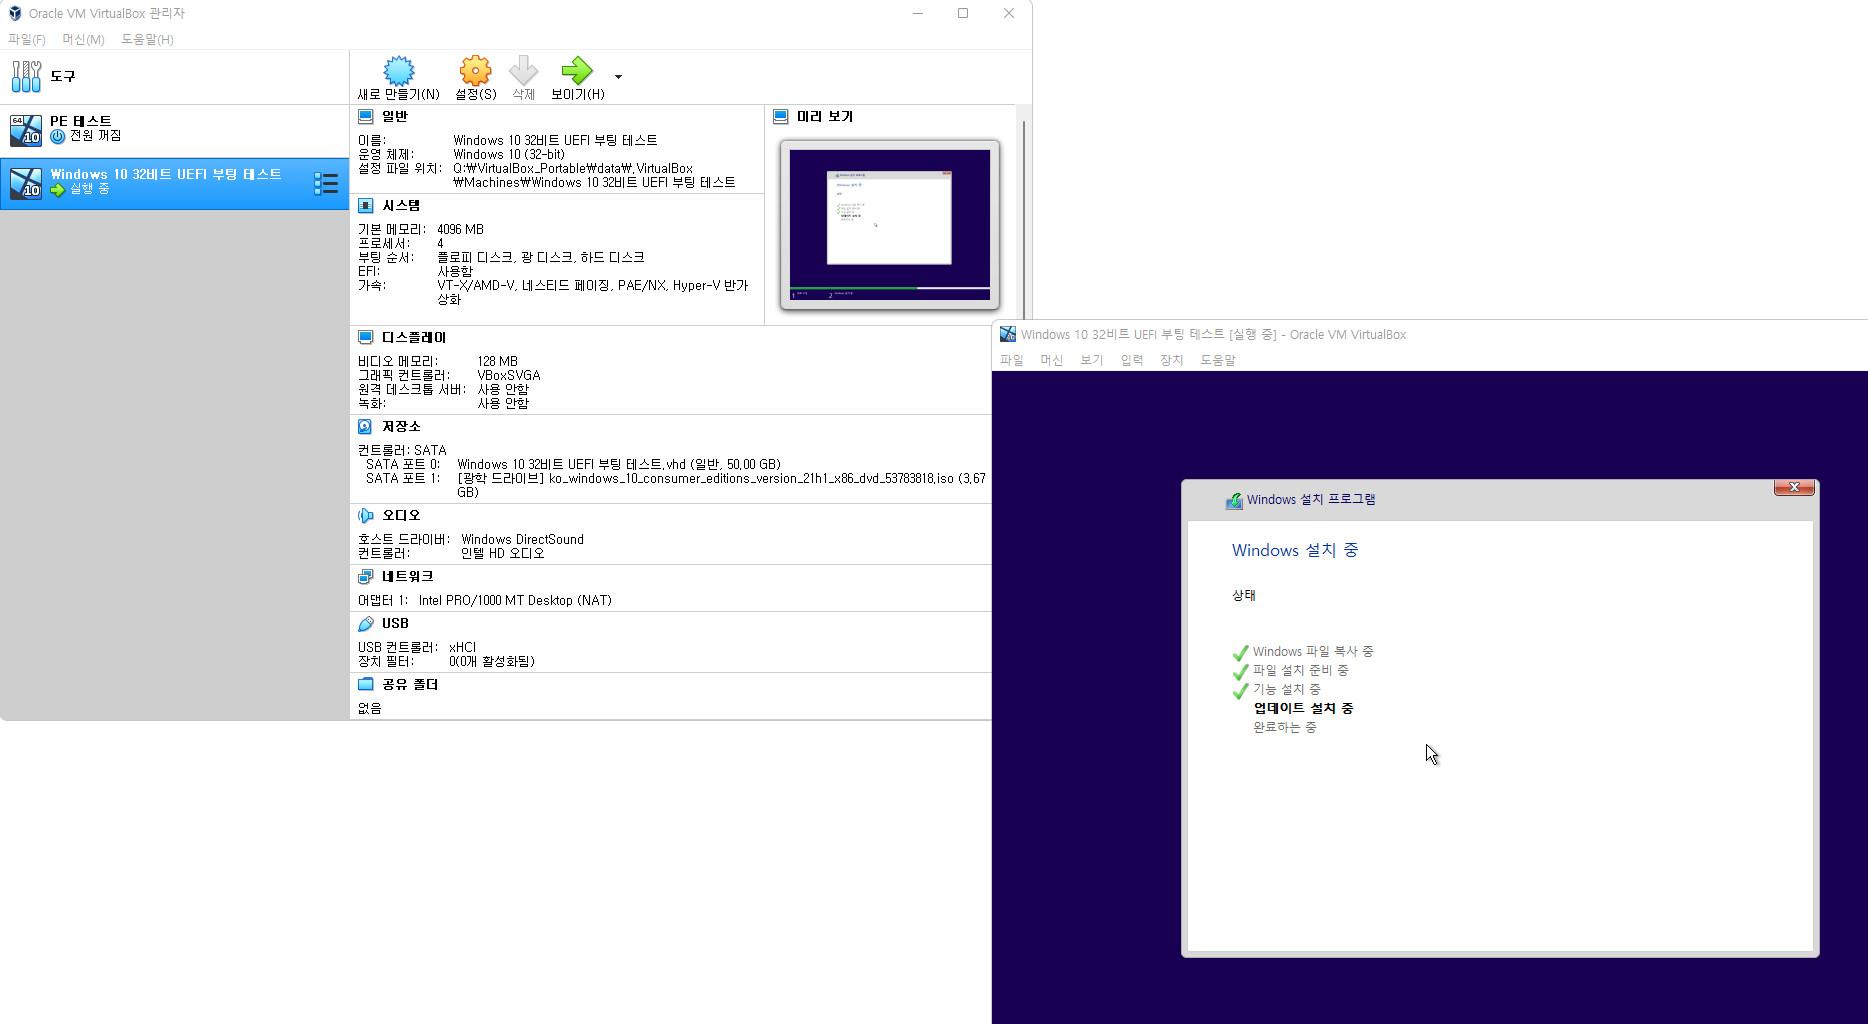 UEFI 부팅은 원래 32비트도 됩니다. 실컴은 메인보드 차원에서 32비트는 제한이 된 것 뿐입니다 - 가상머신에서는 32비트도 UEFI 됩니다 2021-09-08_143251.jpg